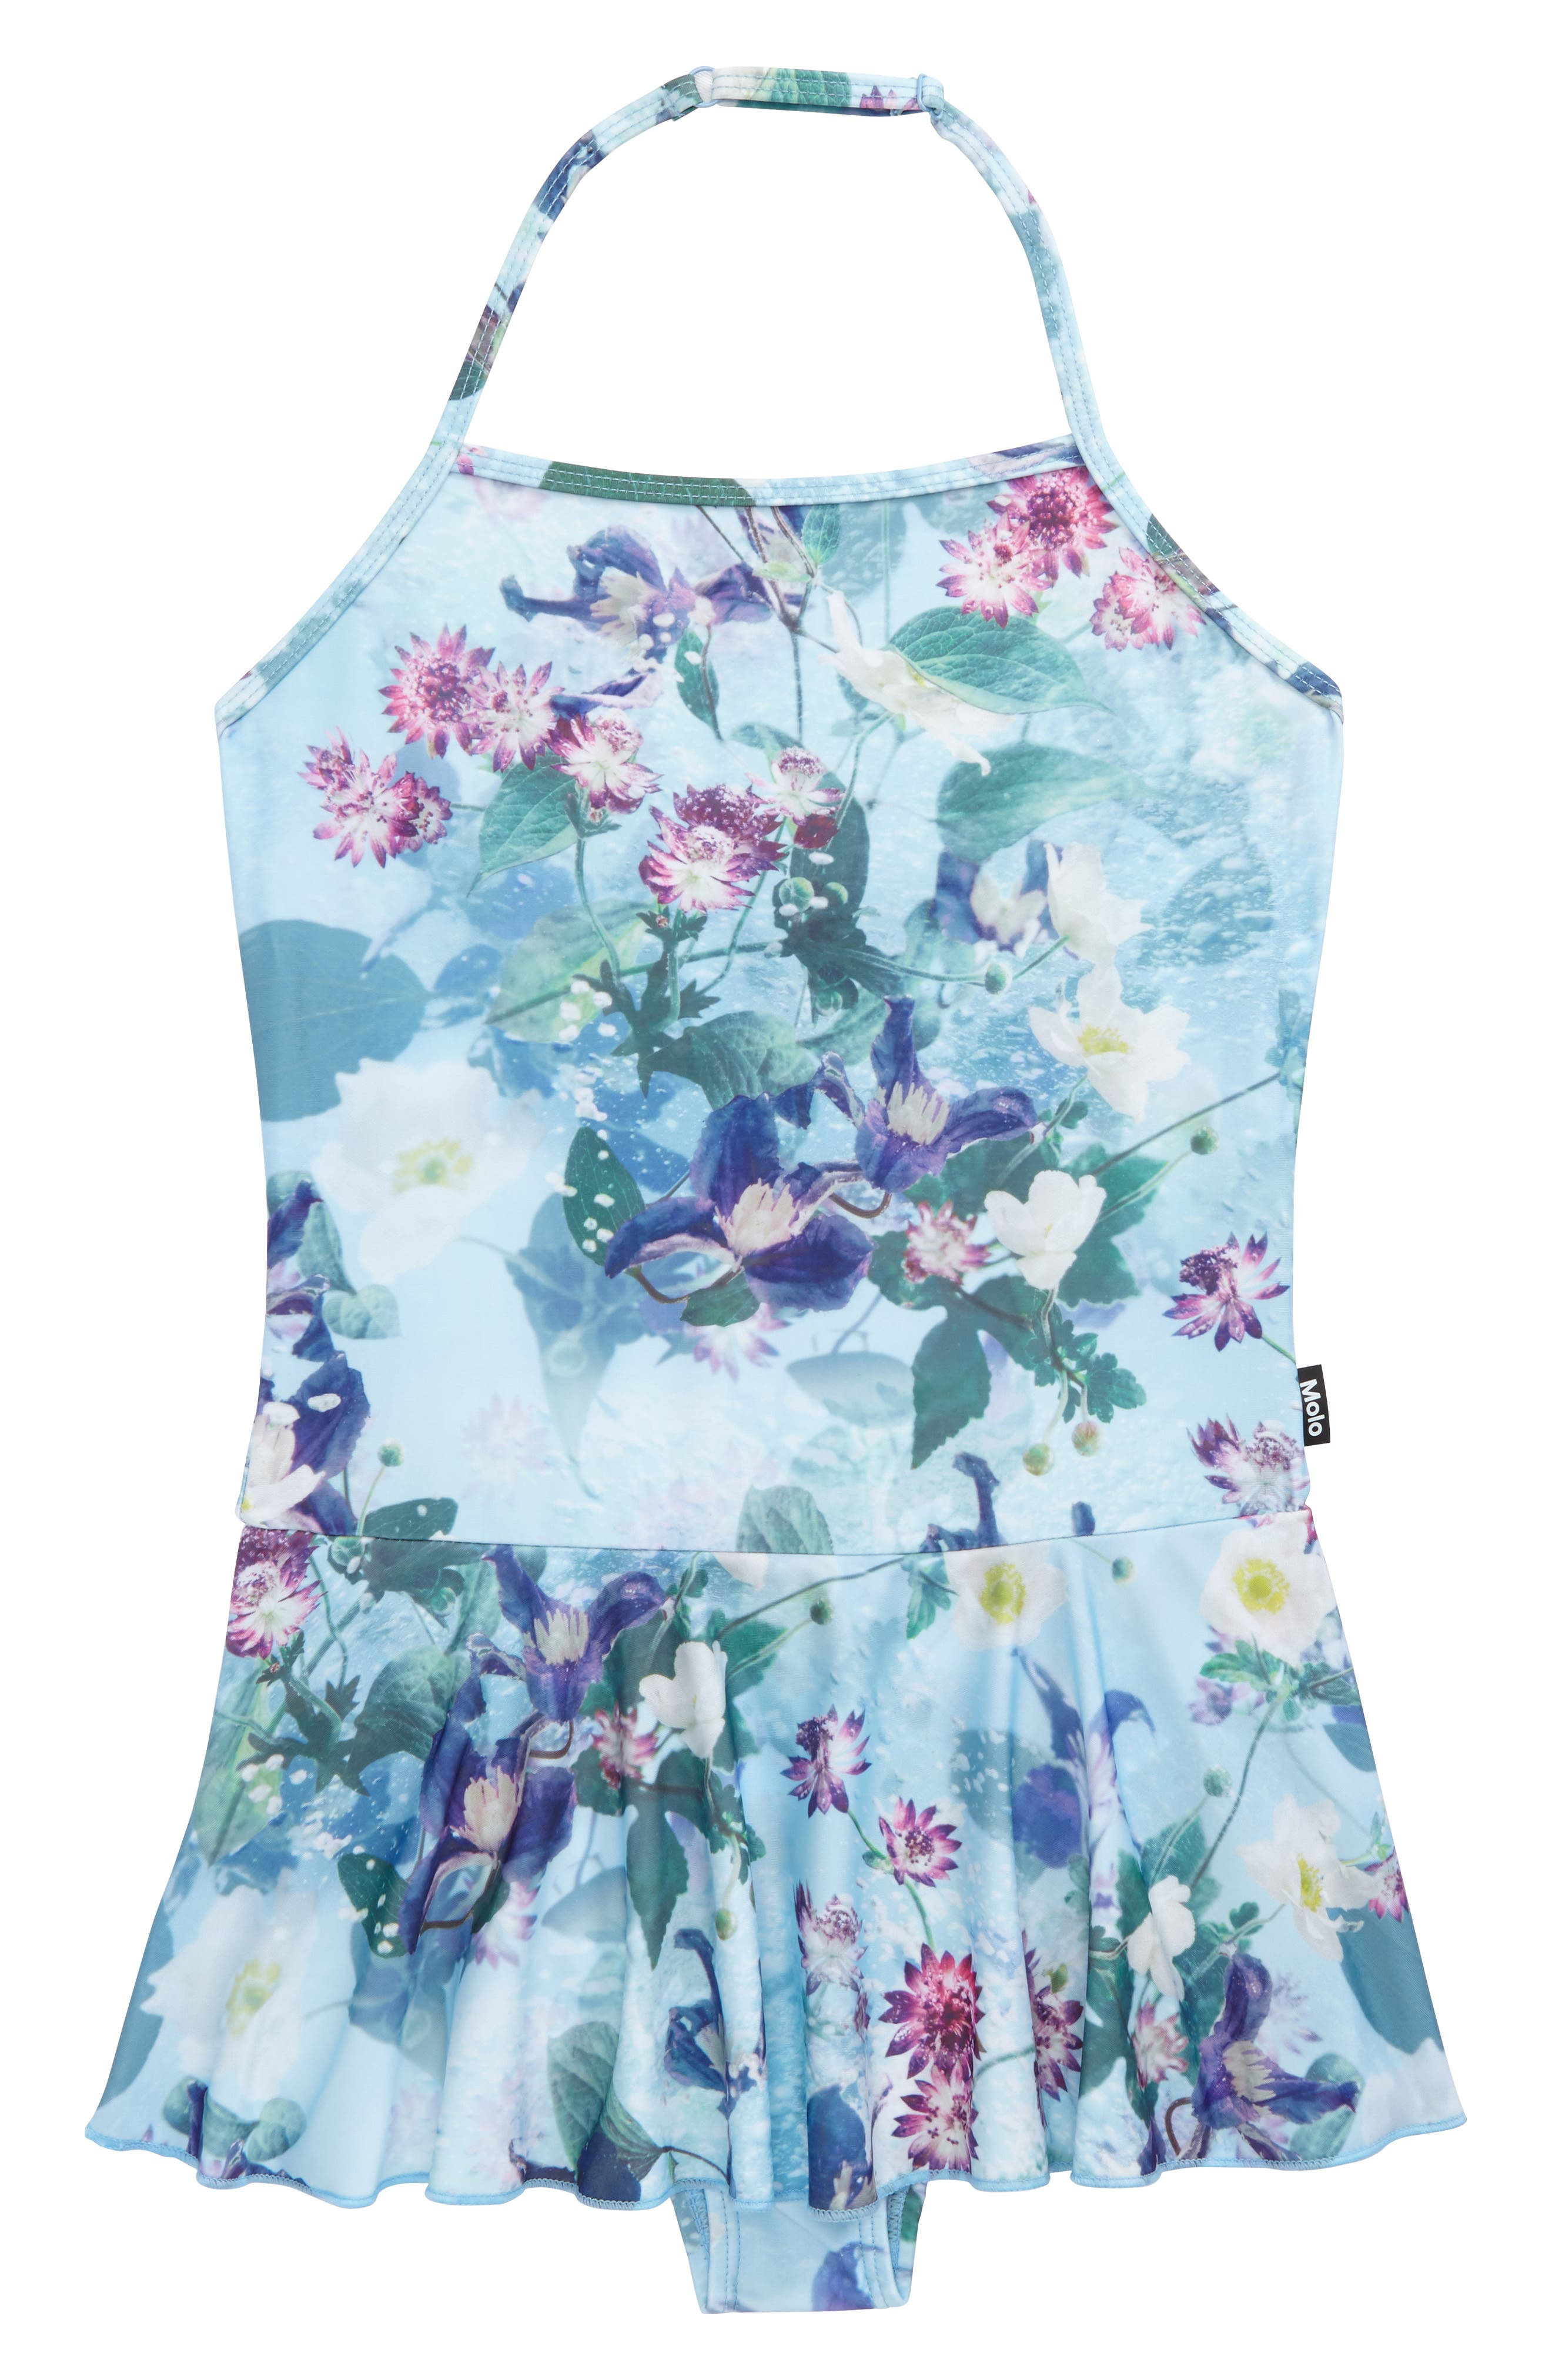 Noelle Skirted One-Piece Swimsuit,                         Main,                         color, Aqua Flowers